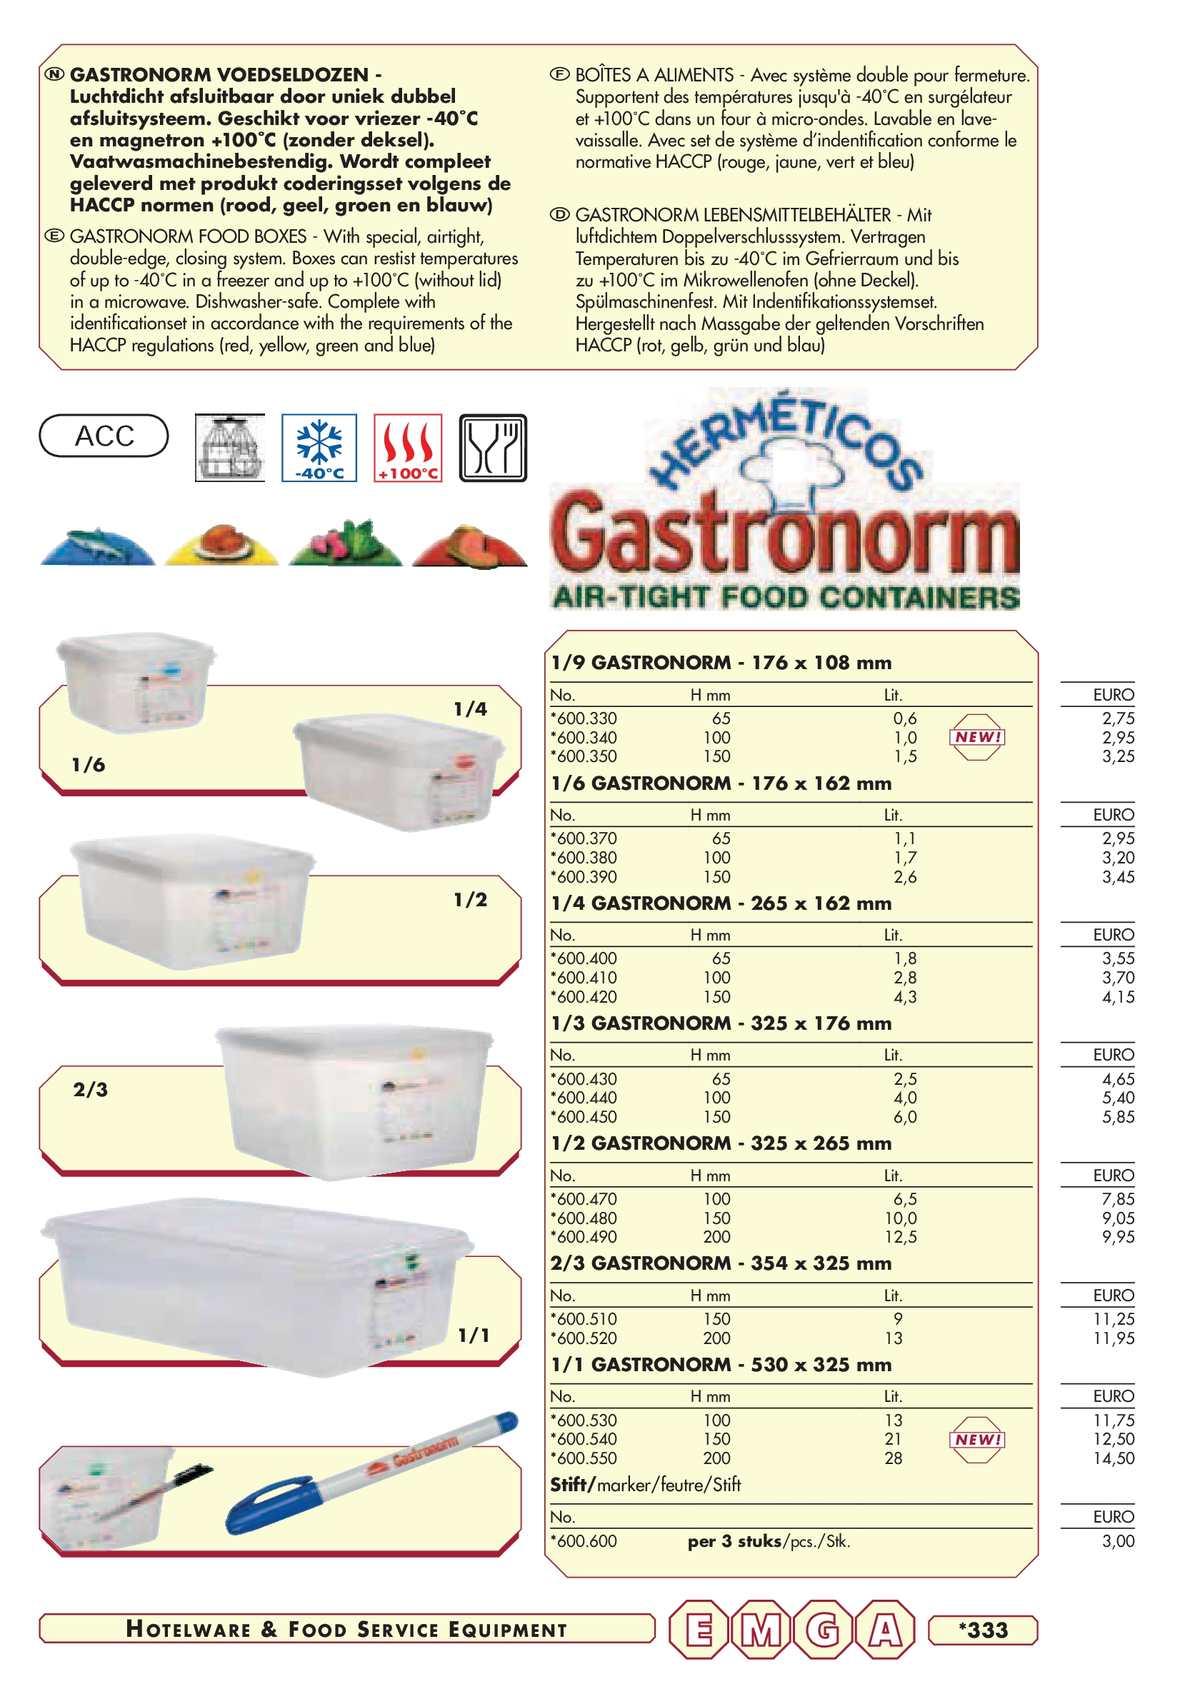 Calamo Catalogue Materiel Horeca Emga De Yatout Partie 2 Gelang Karet Blanden